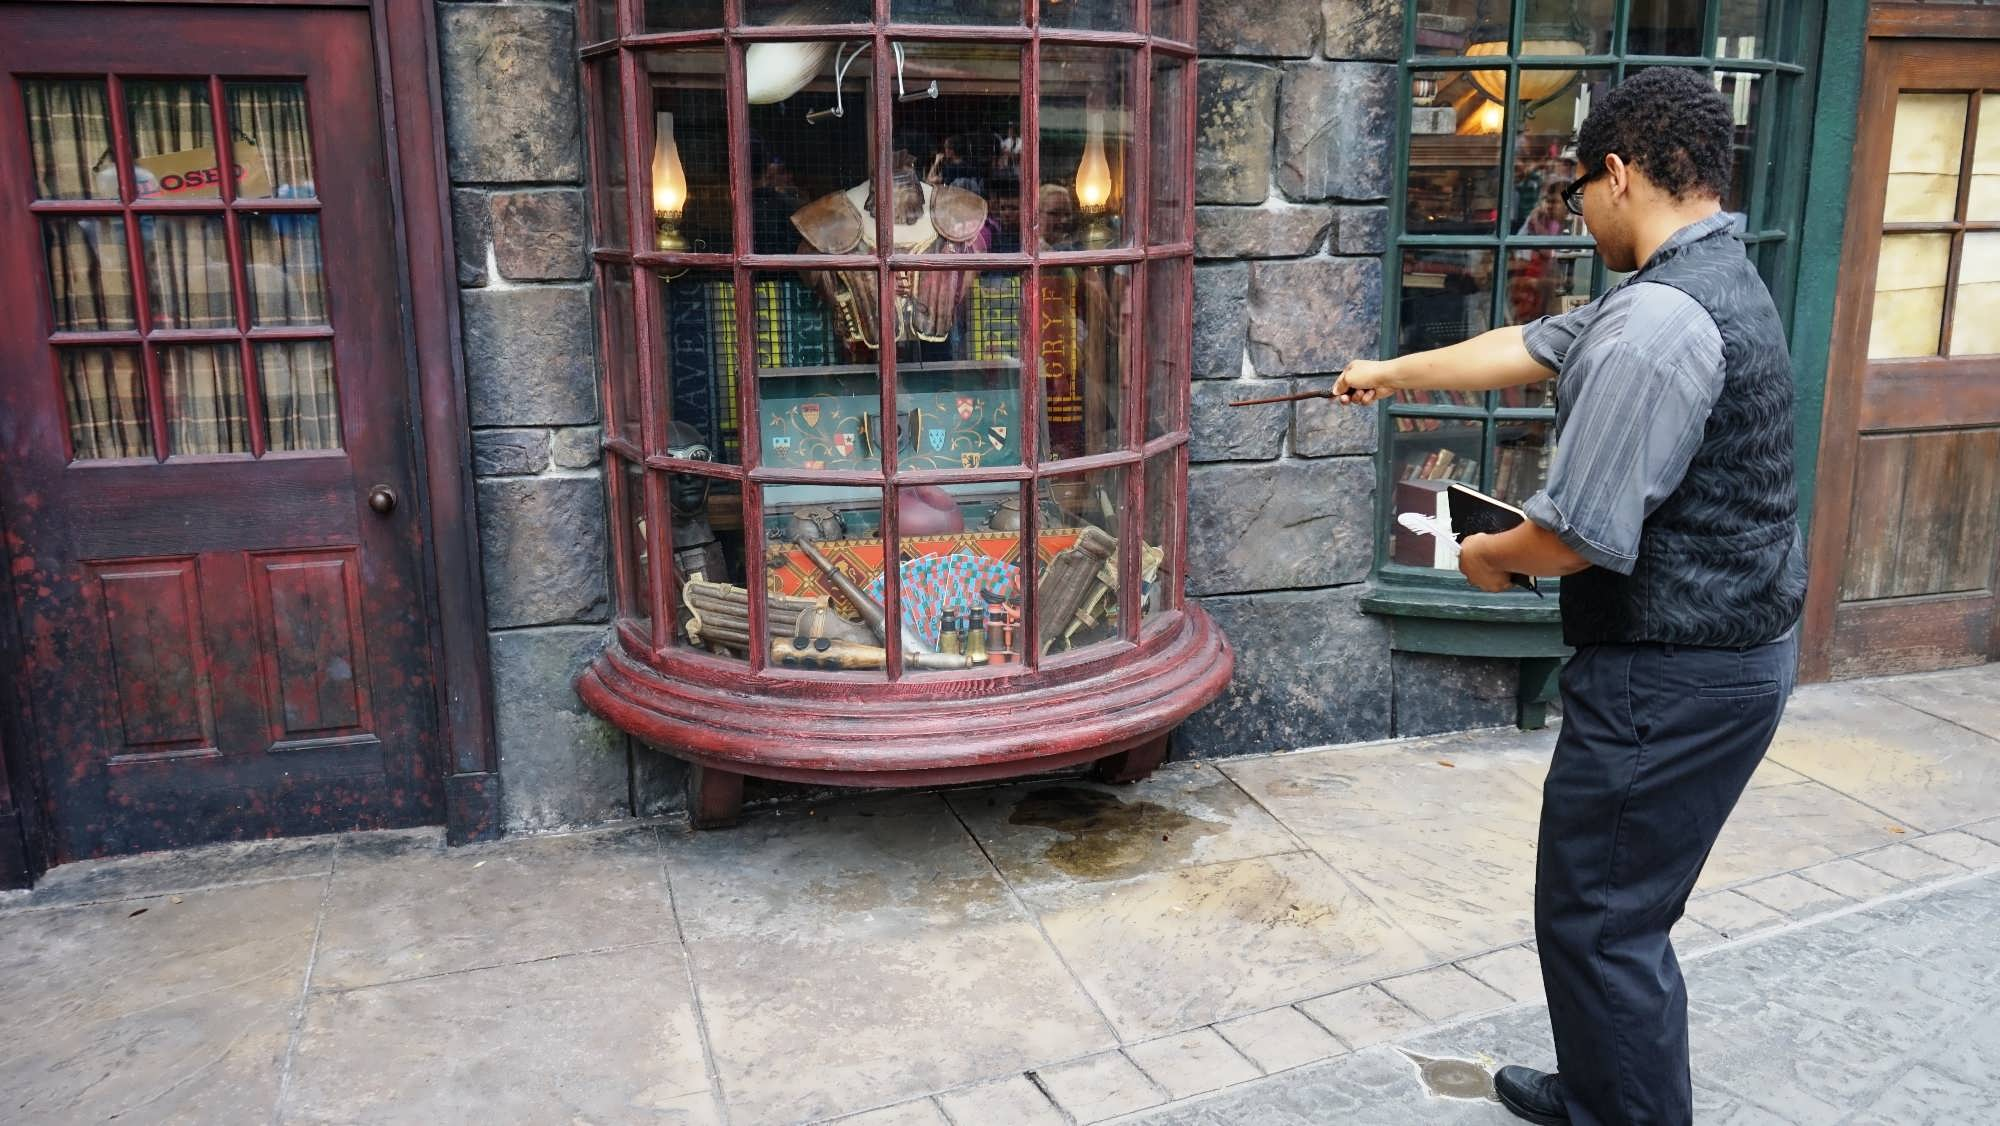 Spell-casting in Hogsmeade